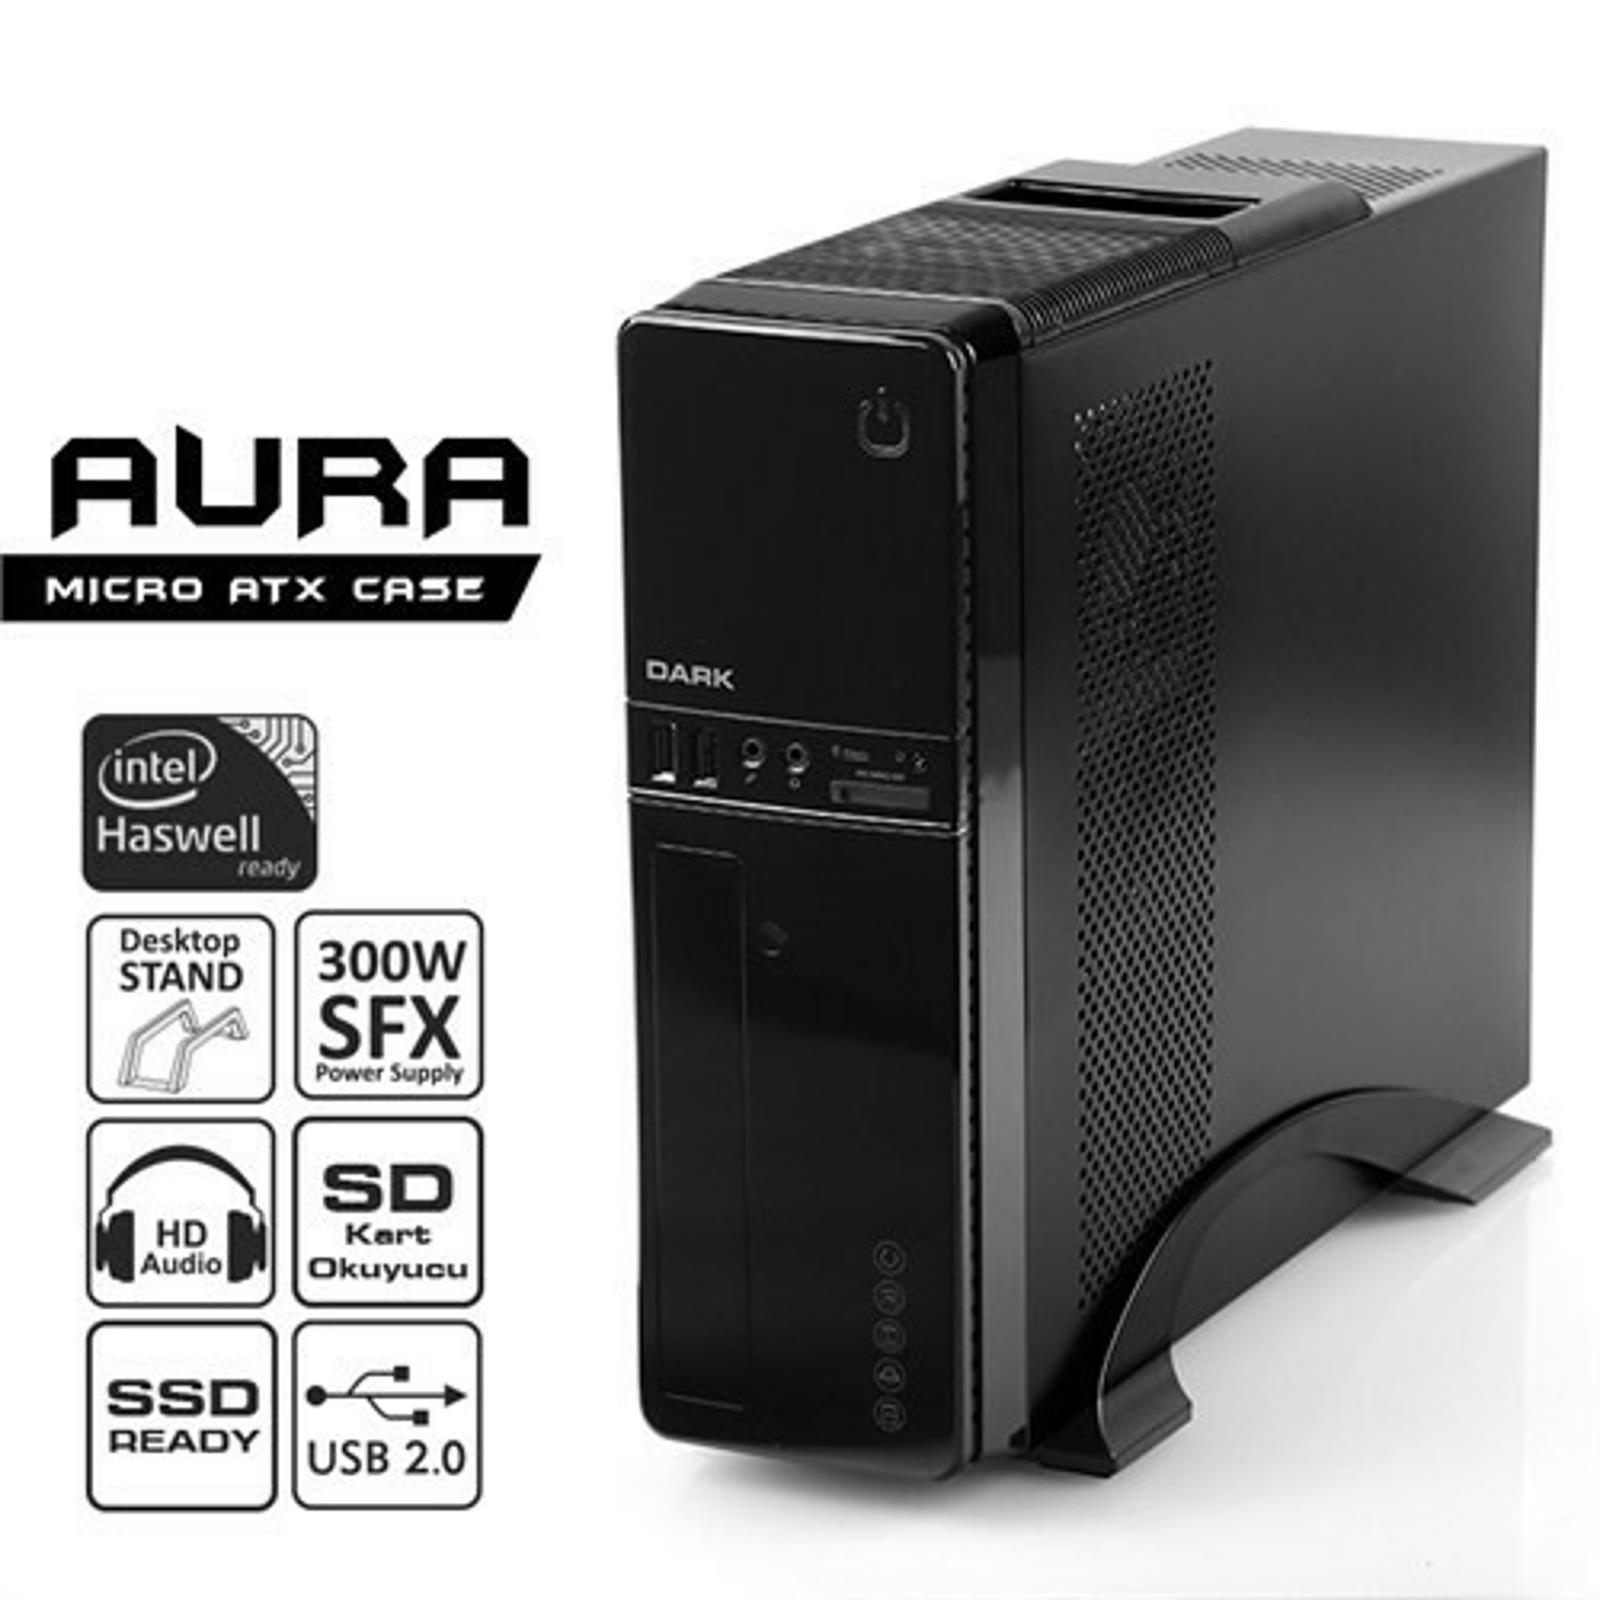 DARK AURA 300W 1x8CM FAN MICRO ATX USB 3.0 SİYAH KASA DKCHAURA300U3